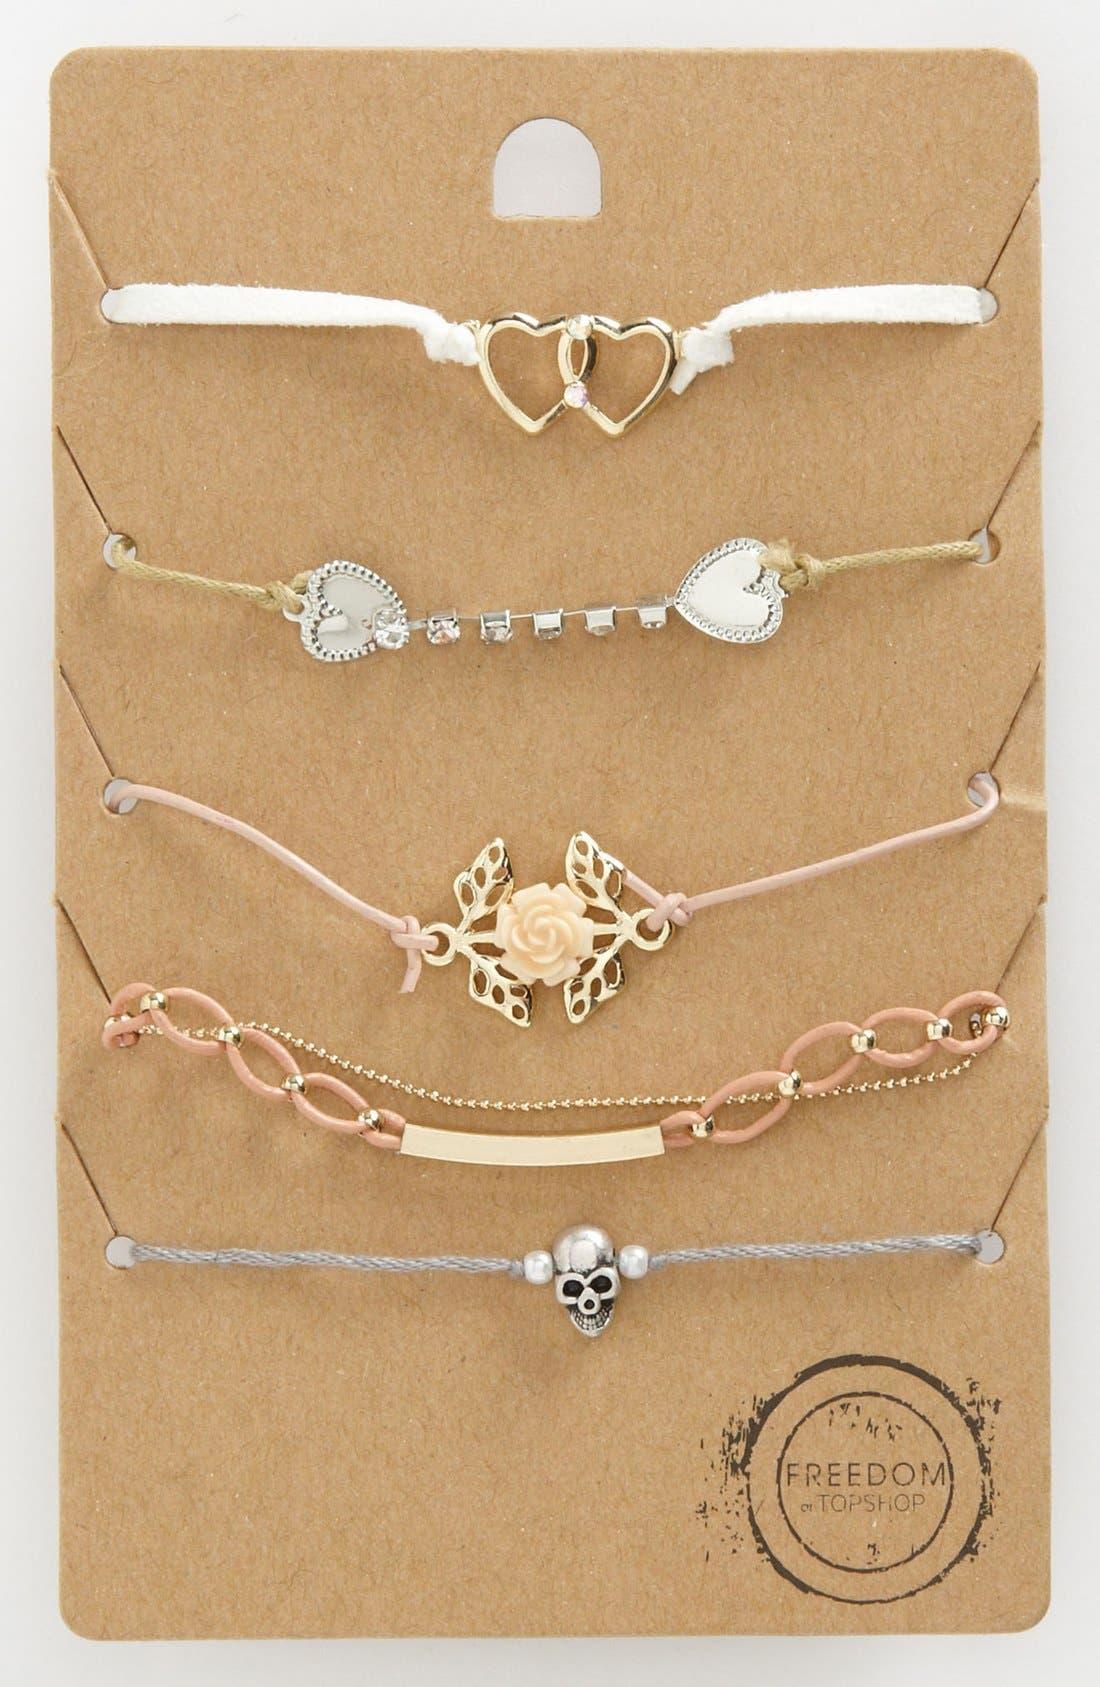 Alternate Image 1 Selected - Topshop 'Pretty' Bracelets (Set of 5)